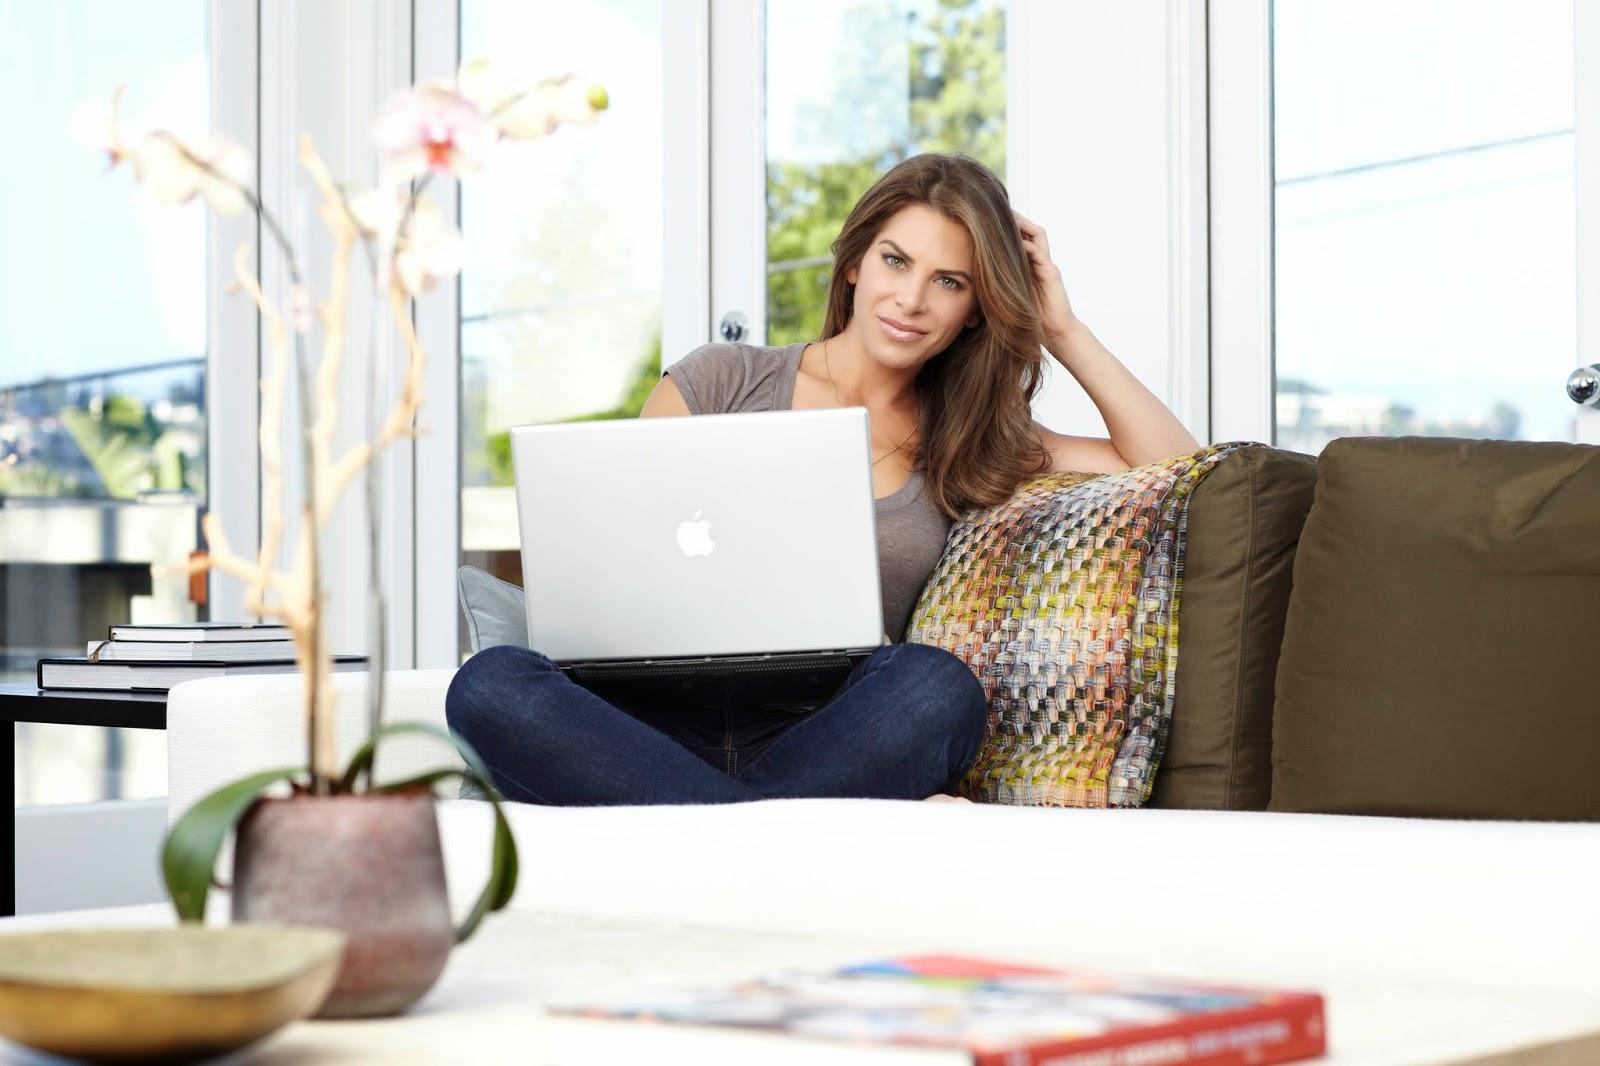 cara nonton tv dengan laptop, menonton televisi menggunakan laptop, laptop menonton televisi tanpa ledtv